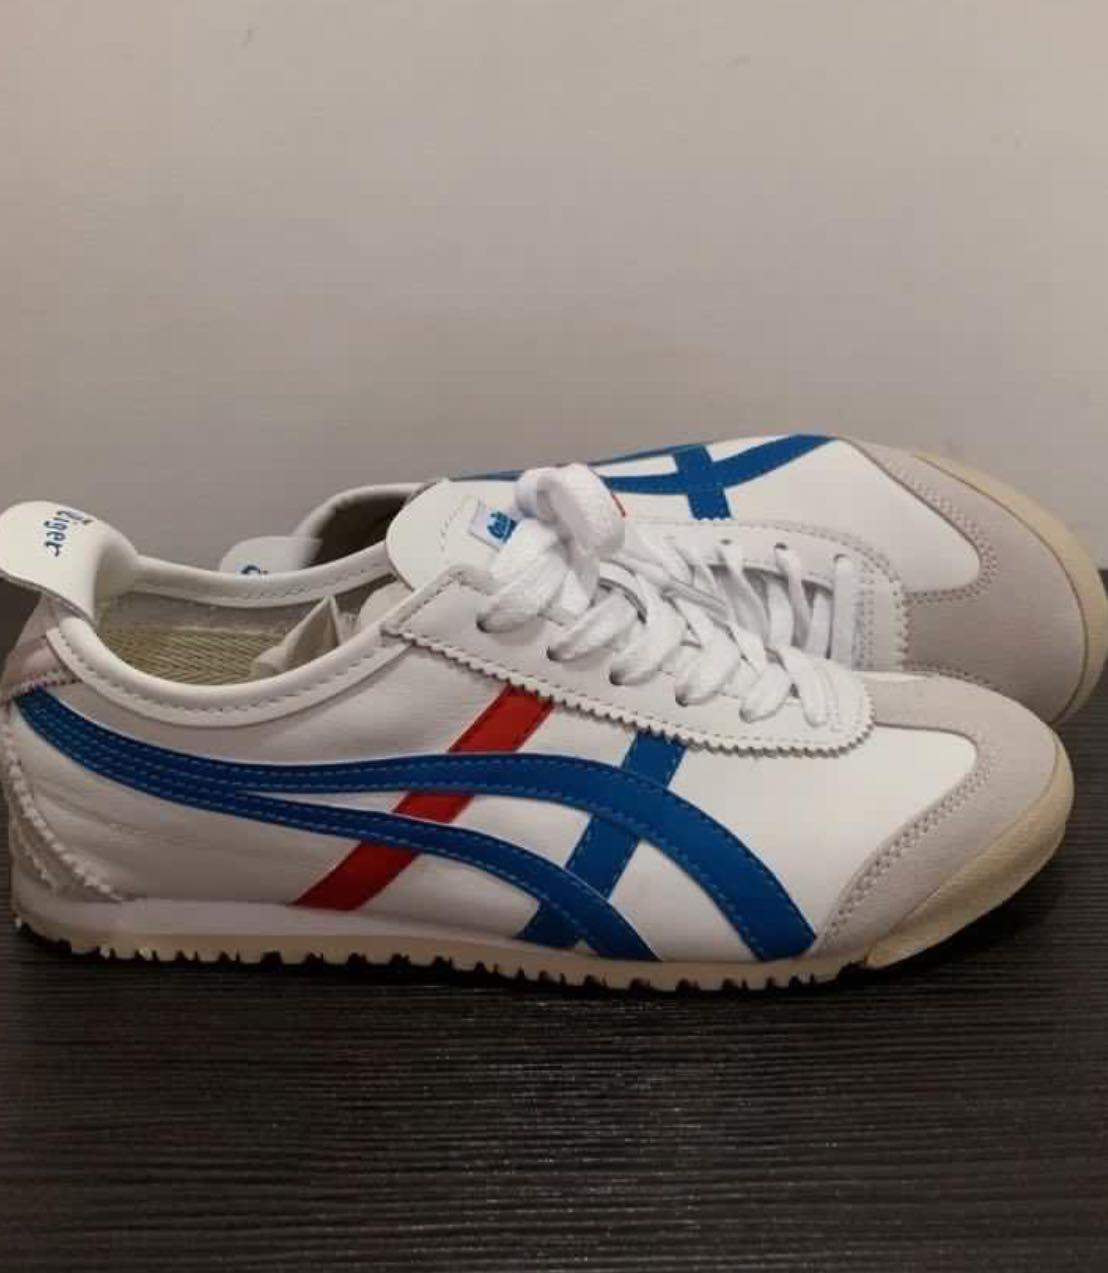 separation shoes 86486 32b2f Onitsuka Tiger Mexico 66 White Blue, Men's Fashion, Footwear ...